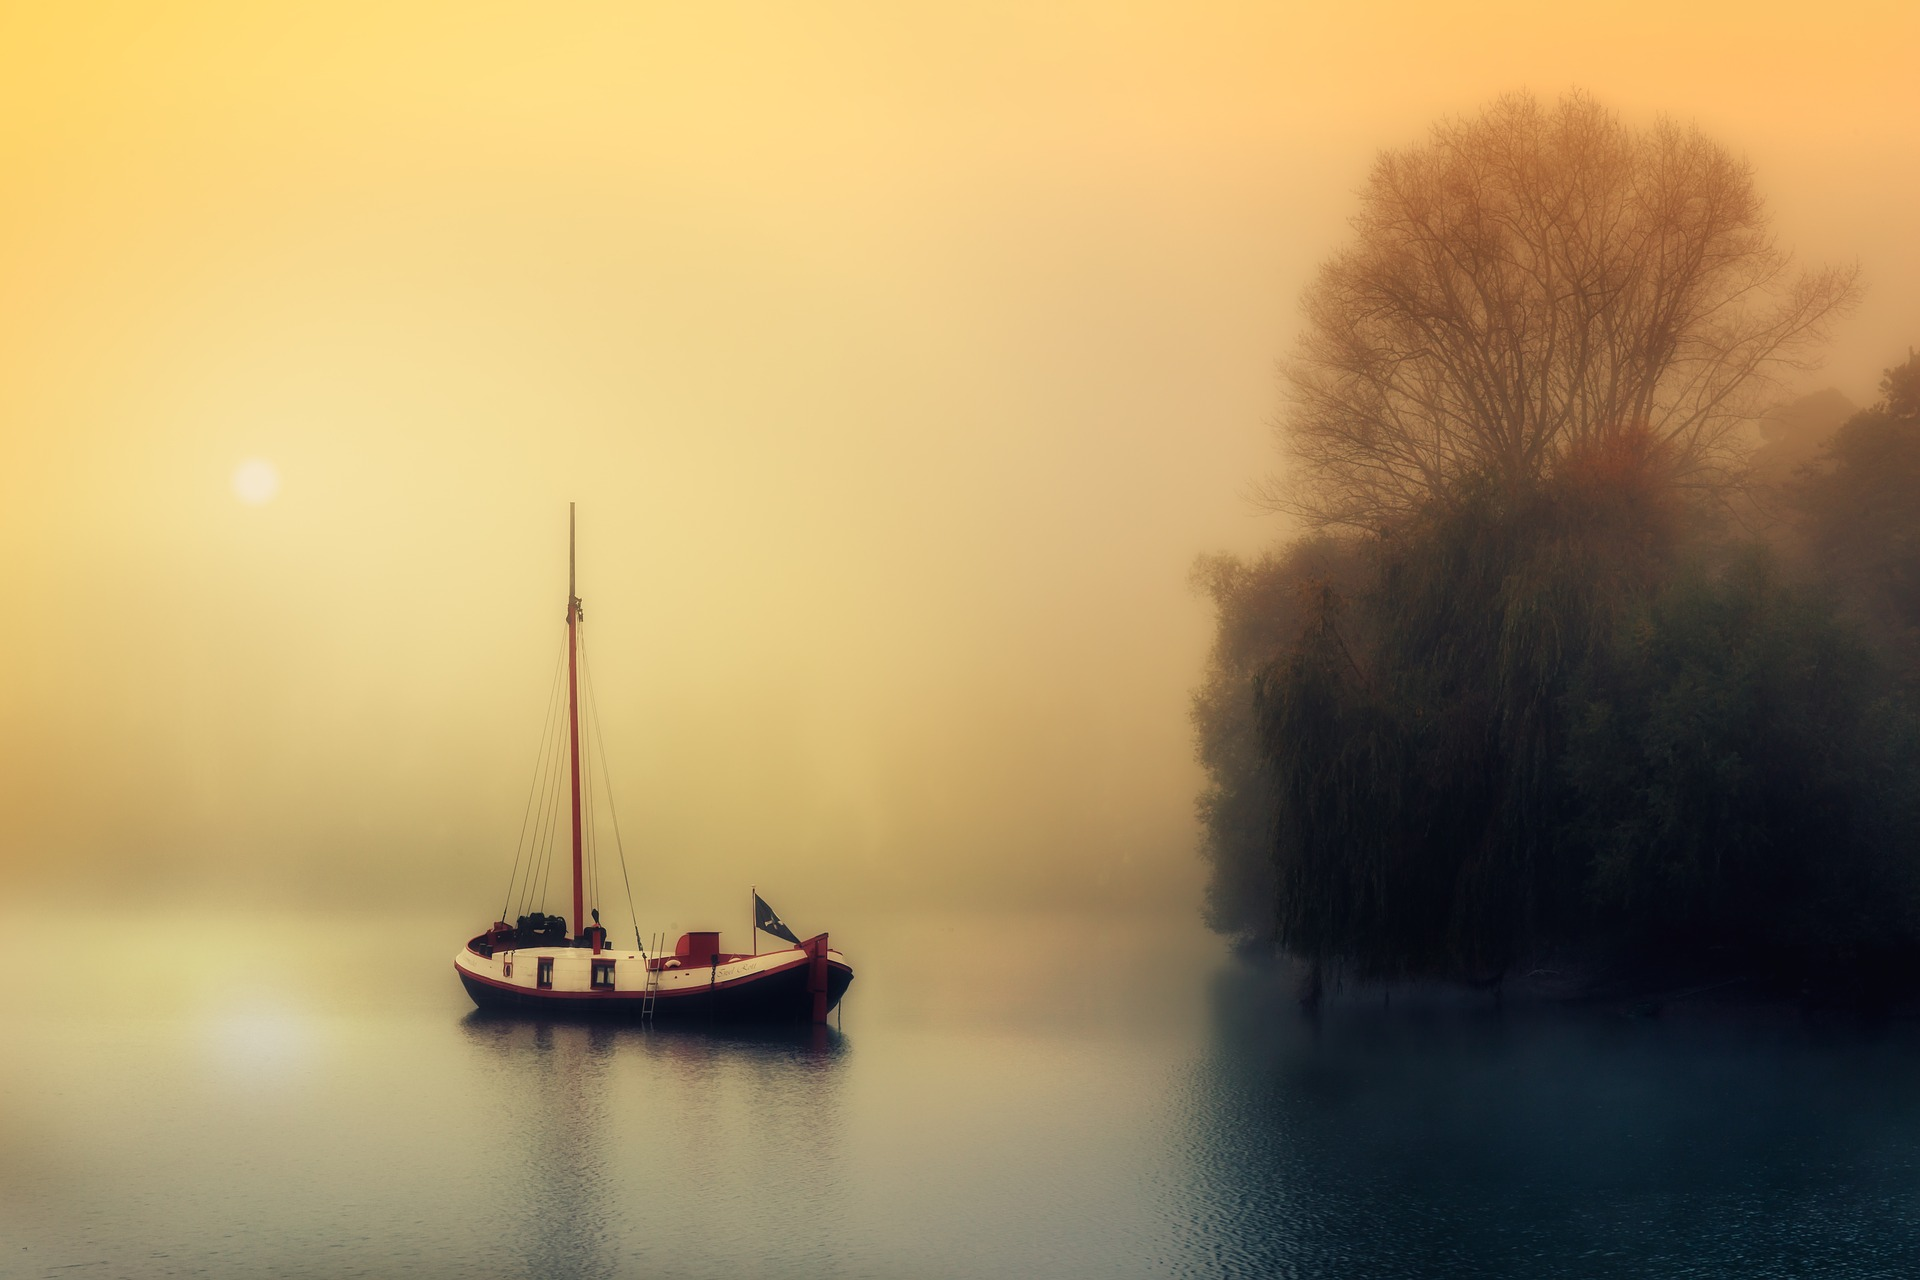 boat-1992137_1920.jpg